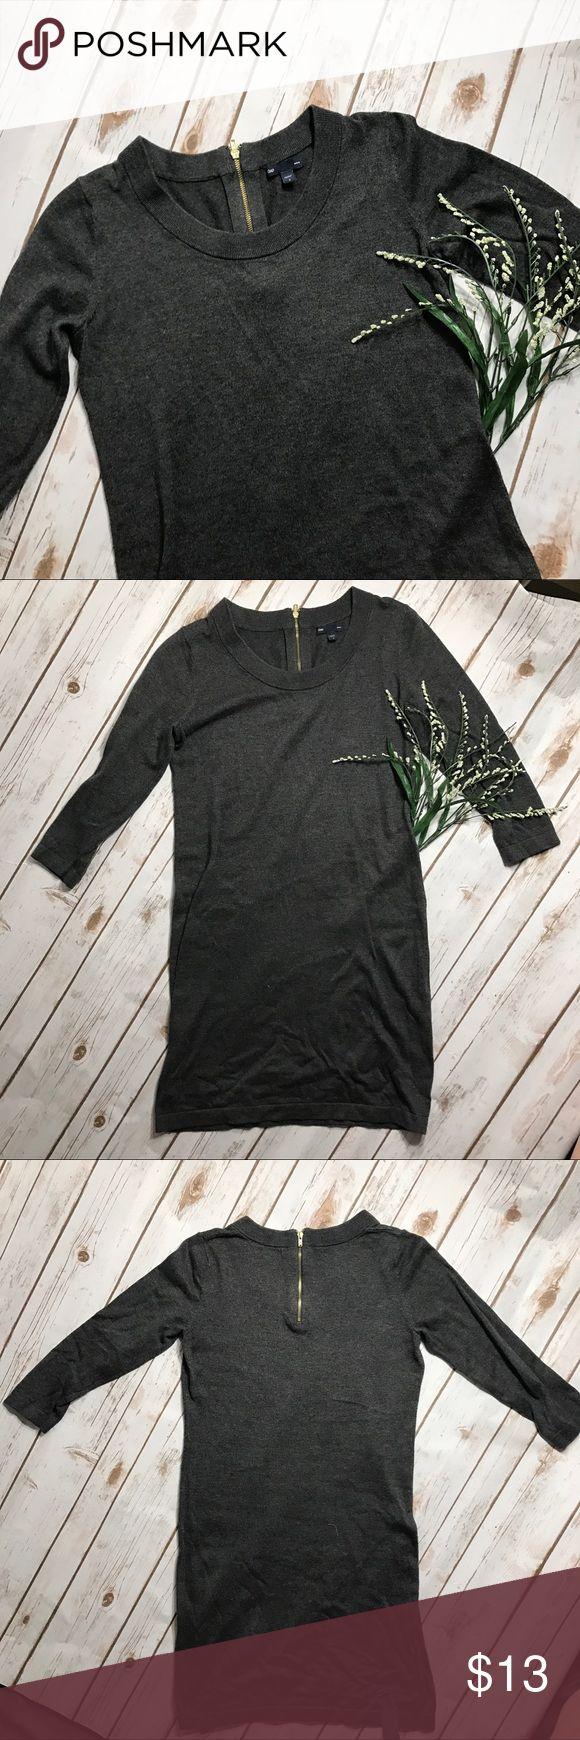 Gap sweater dress Cute knee length Long sleeve sweater dress. Make me an offer. Ask me any questions! 🙂 GAP Dresses Long Sleeve